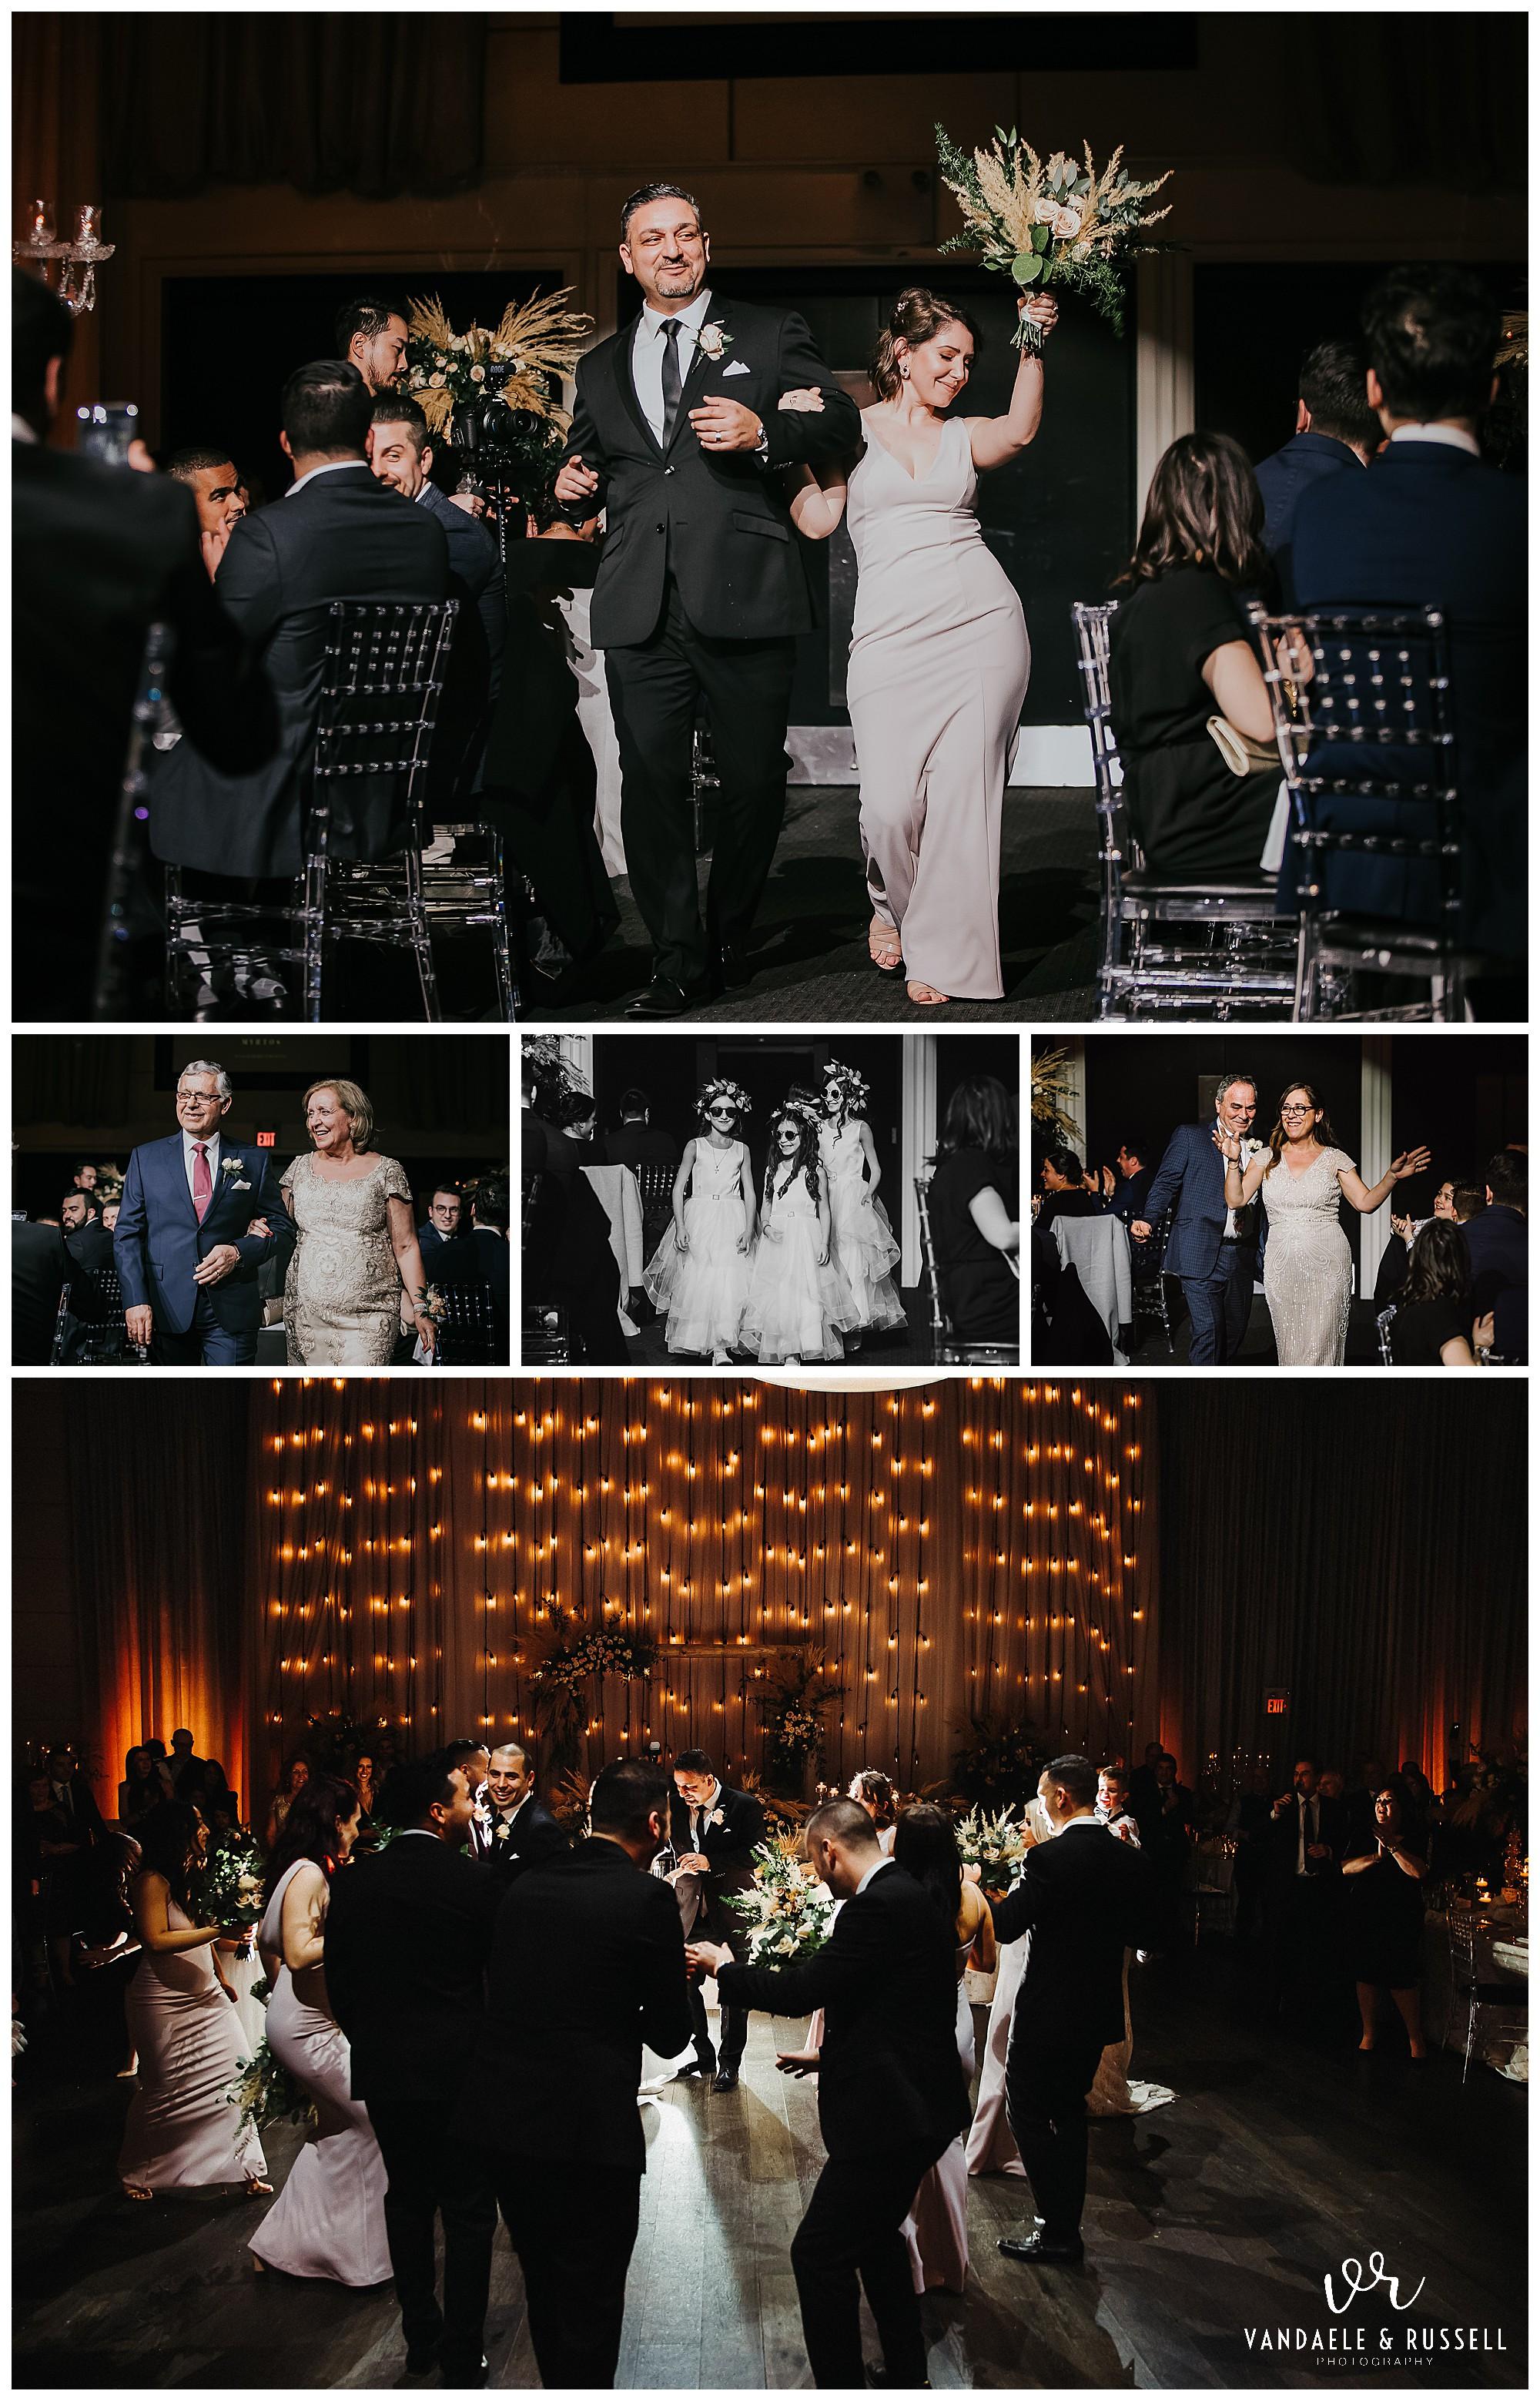 Joanna-Christos-Grand-Luxe-Wedding-Photos-Mint-Room-Toronto-VanDaele-Russell_0098.jpg